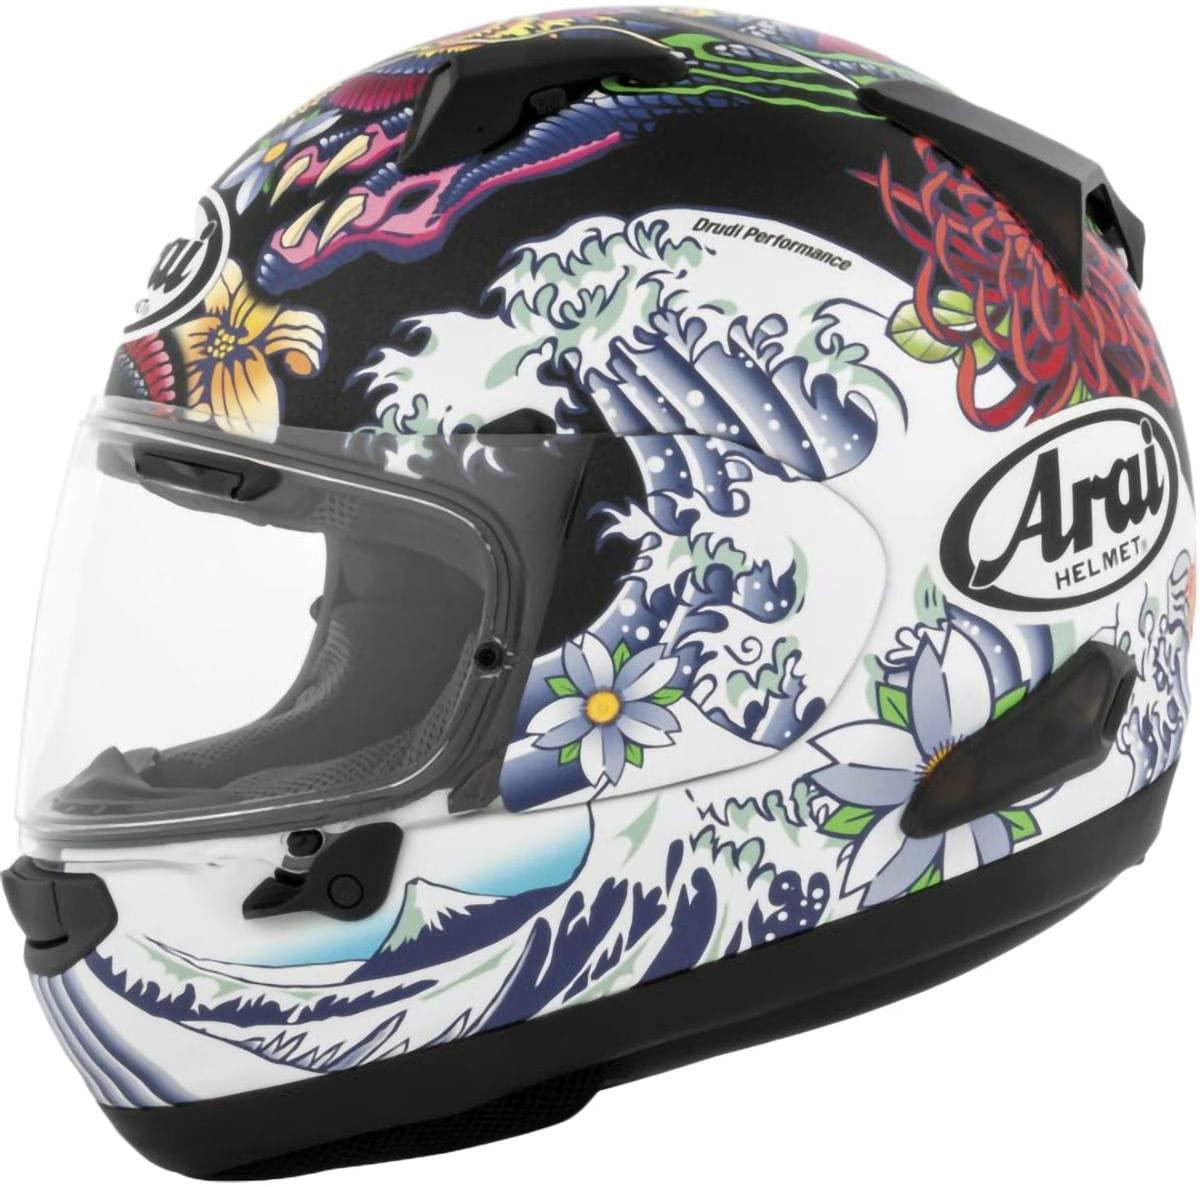 Arai Quantum X Helmet - Oriental (Large) (Frost Black)